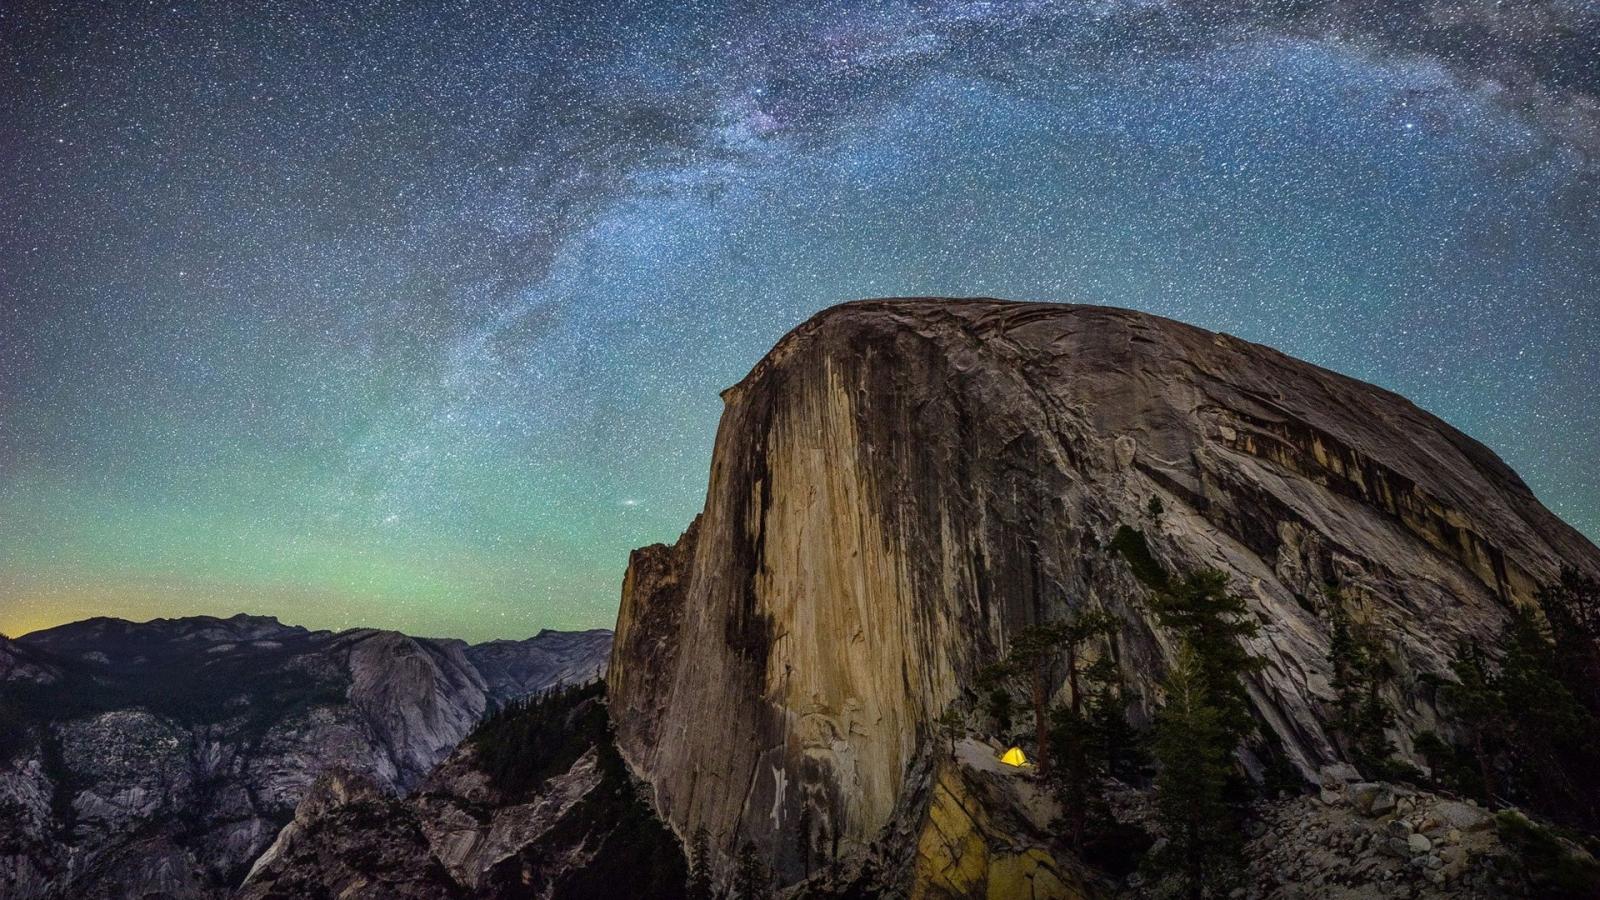 download Yosemite Camp 1080p Wallpaper New HD Wallpapers 1600x900